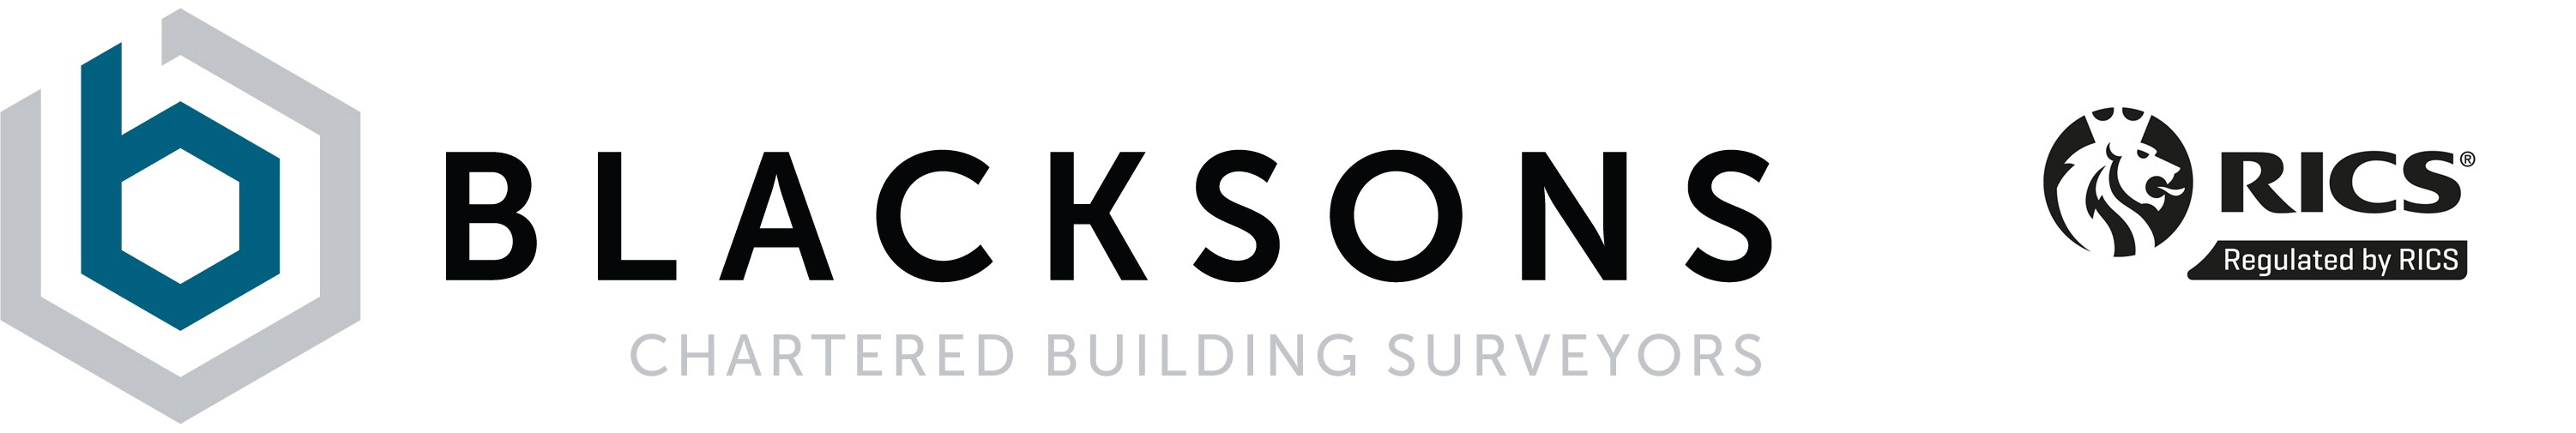 Blacksons-Chartered-Building-Surveyors